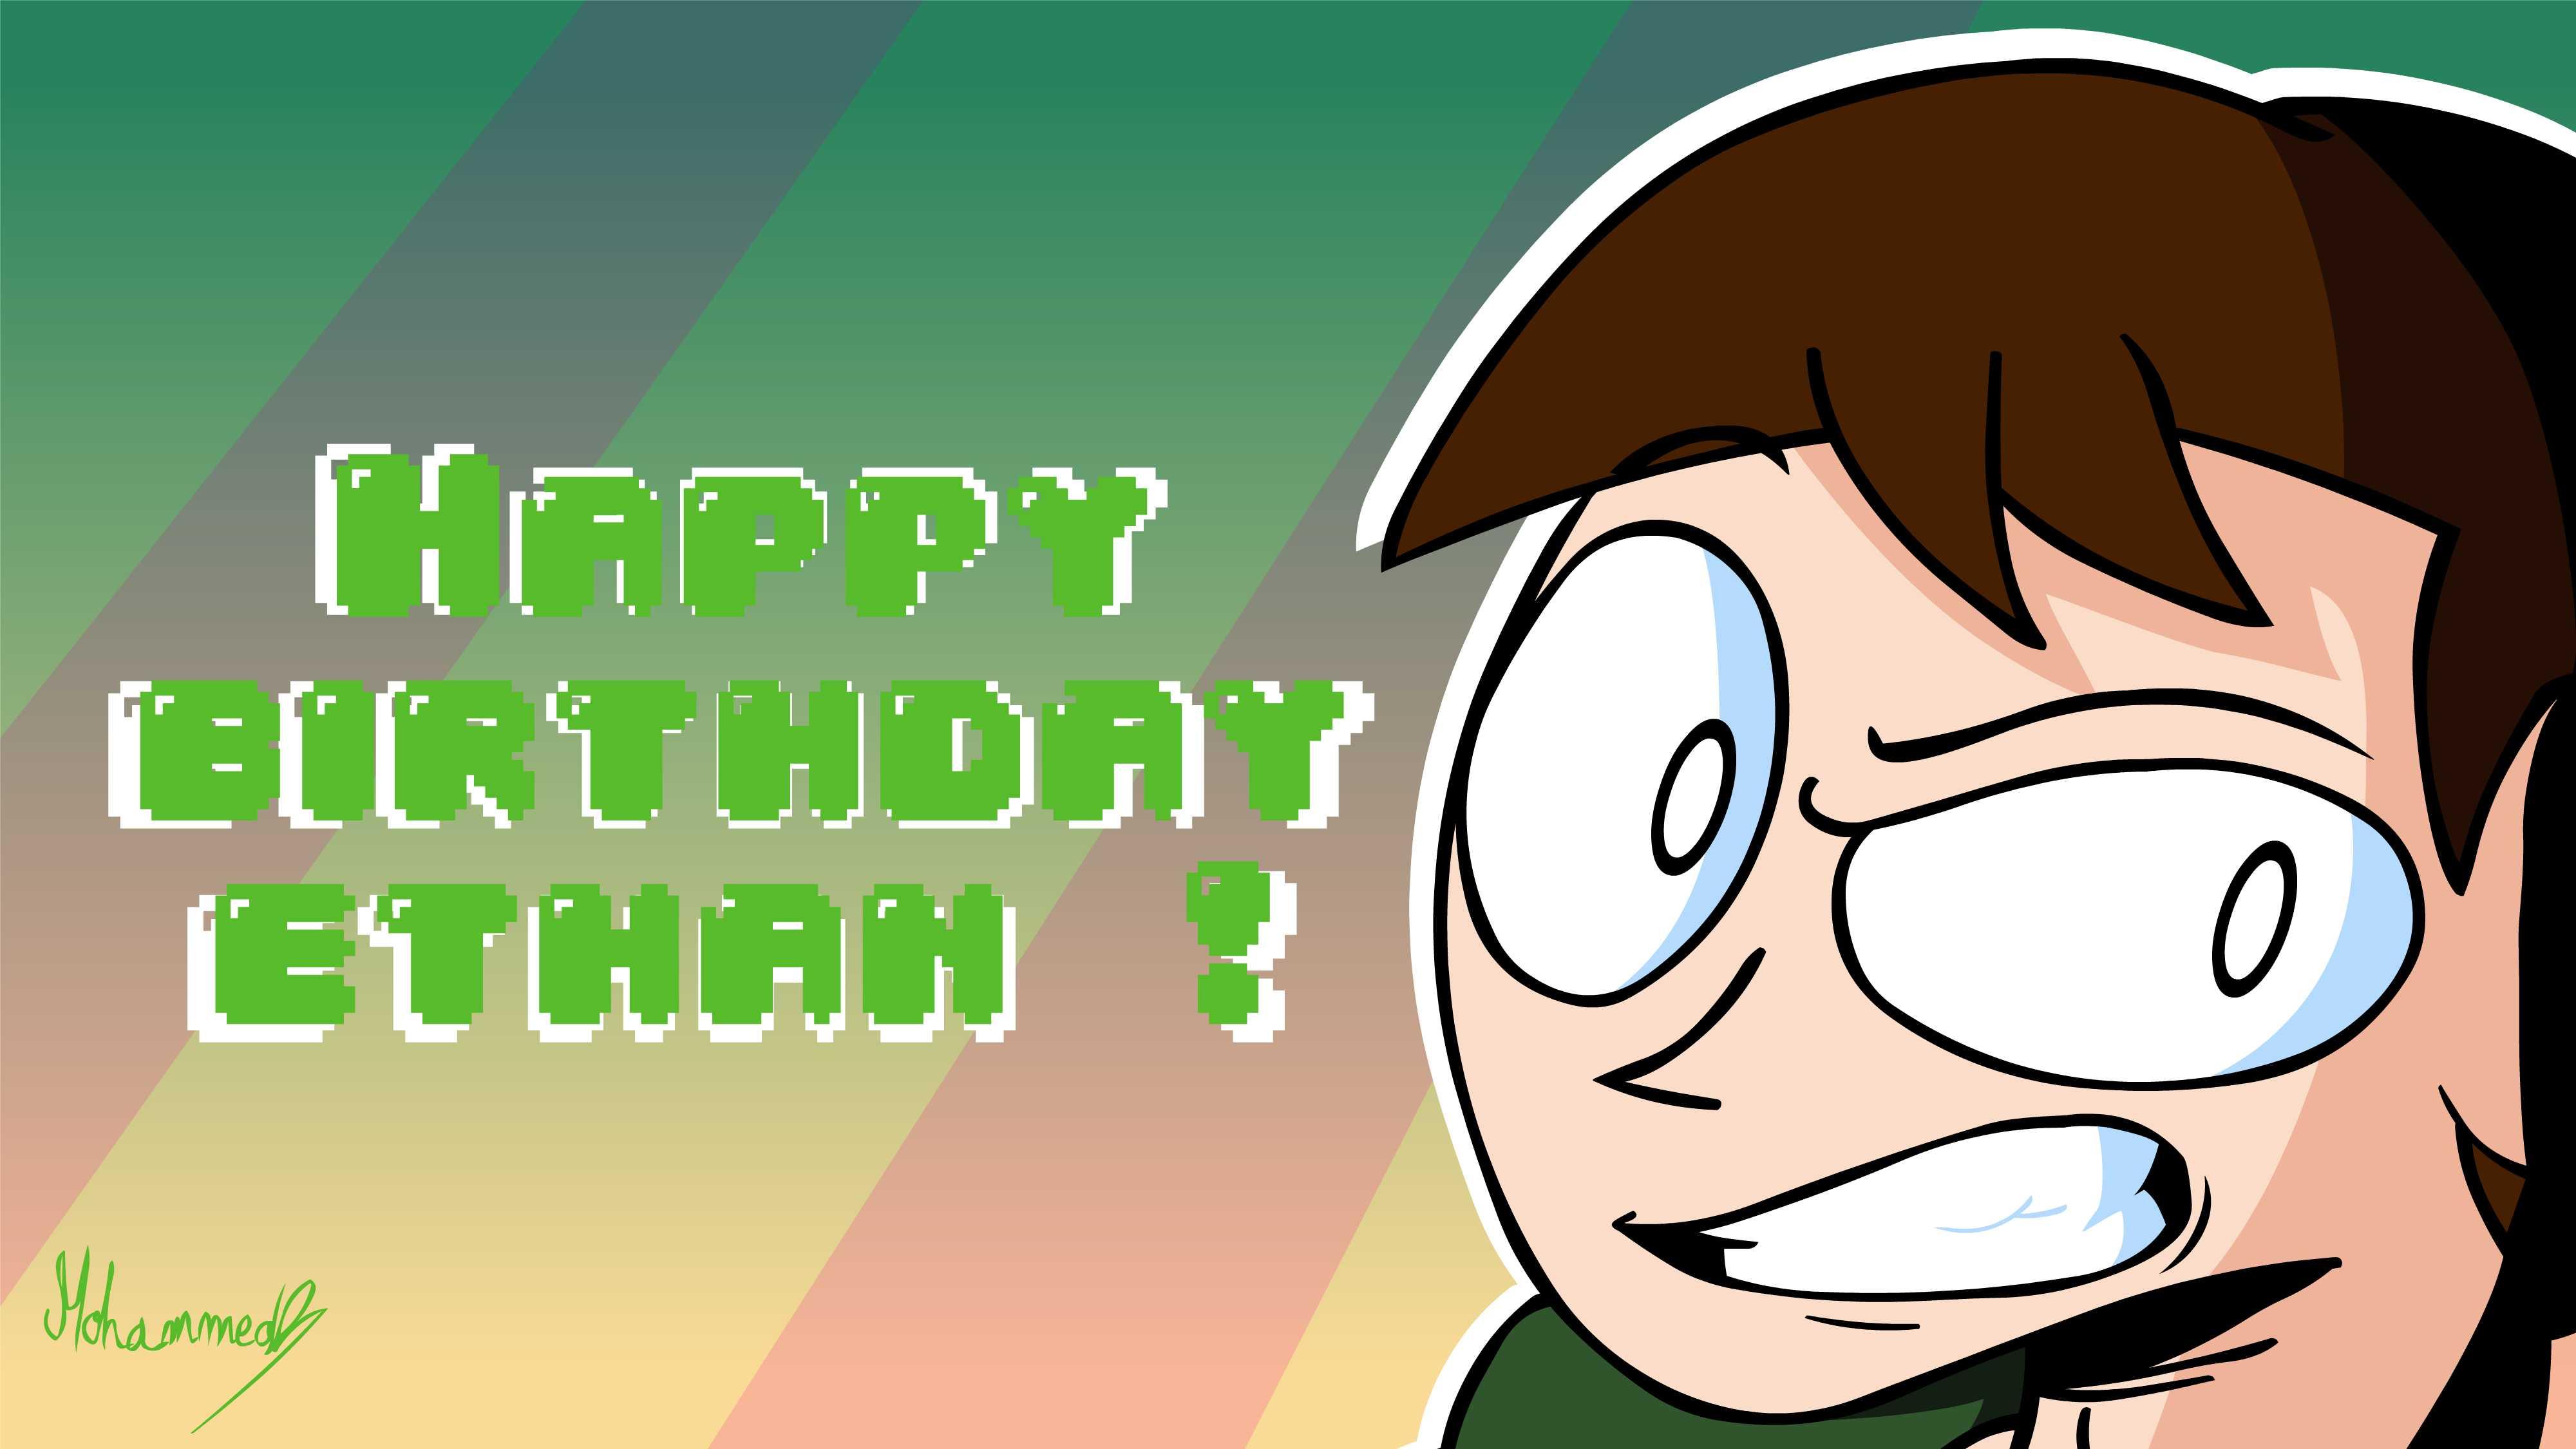 Happy birthday Ethan (TheMewx) !